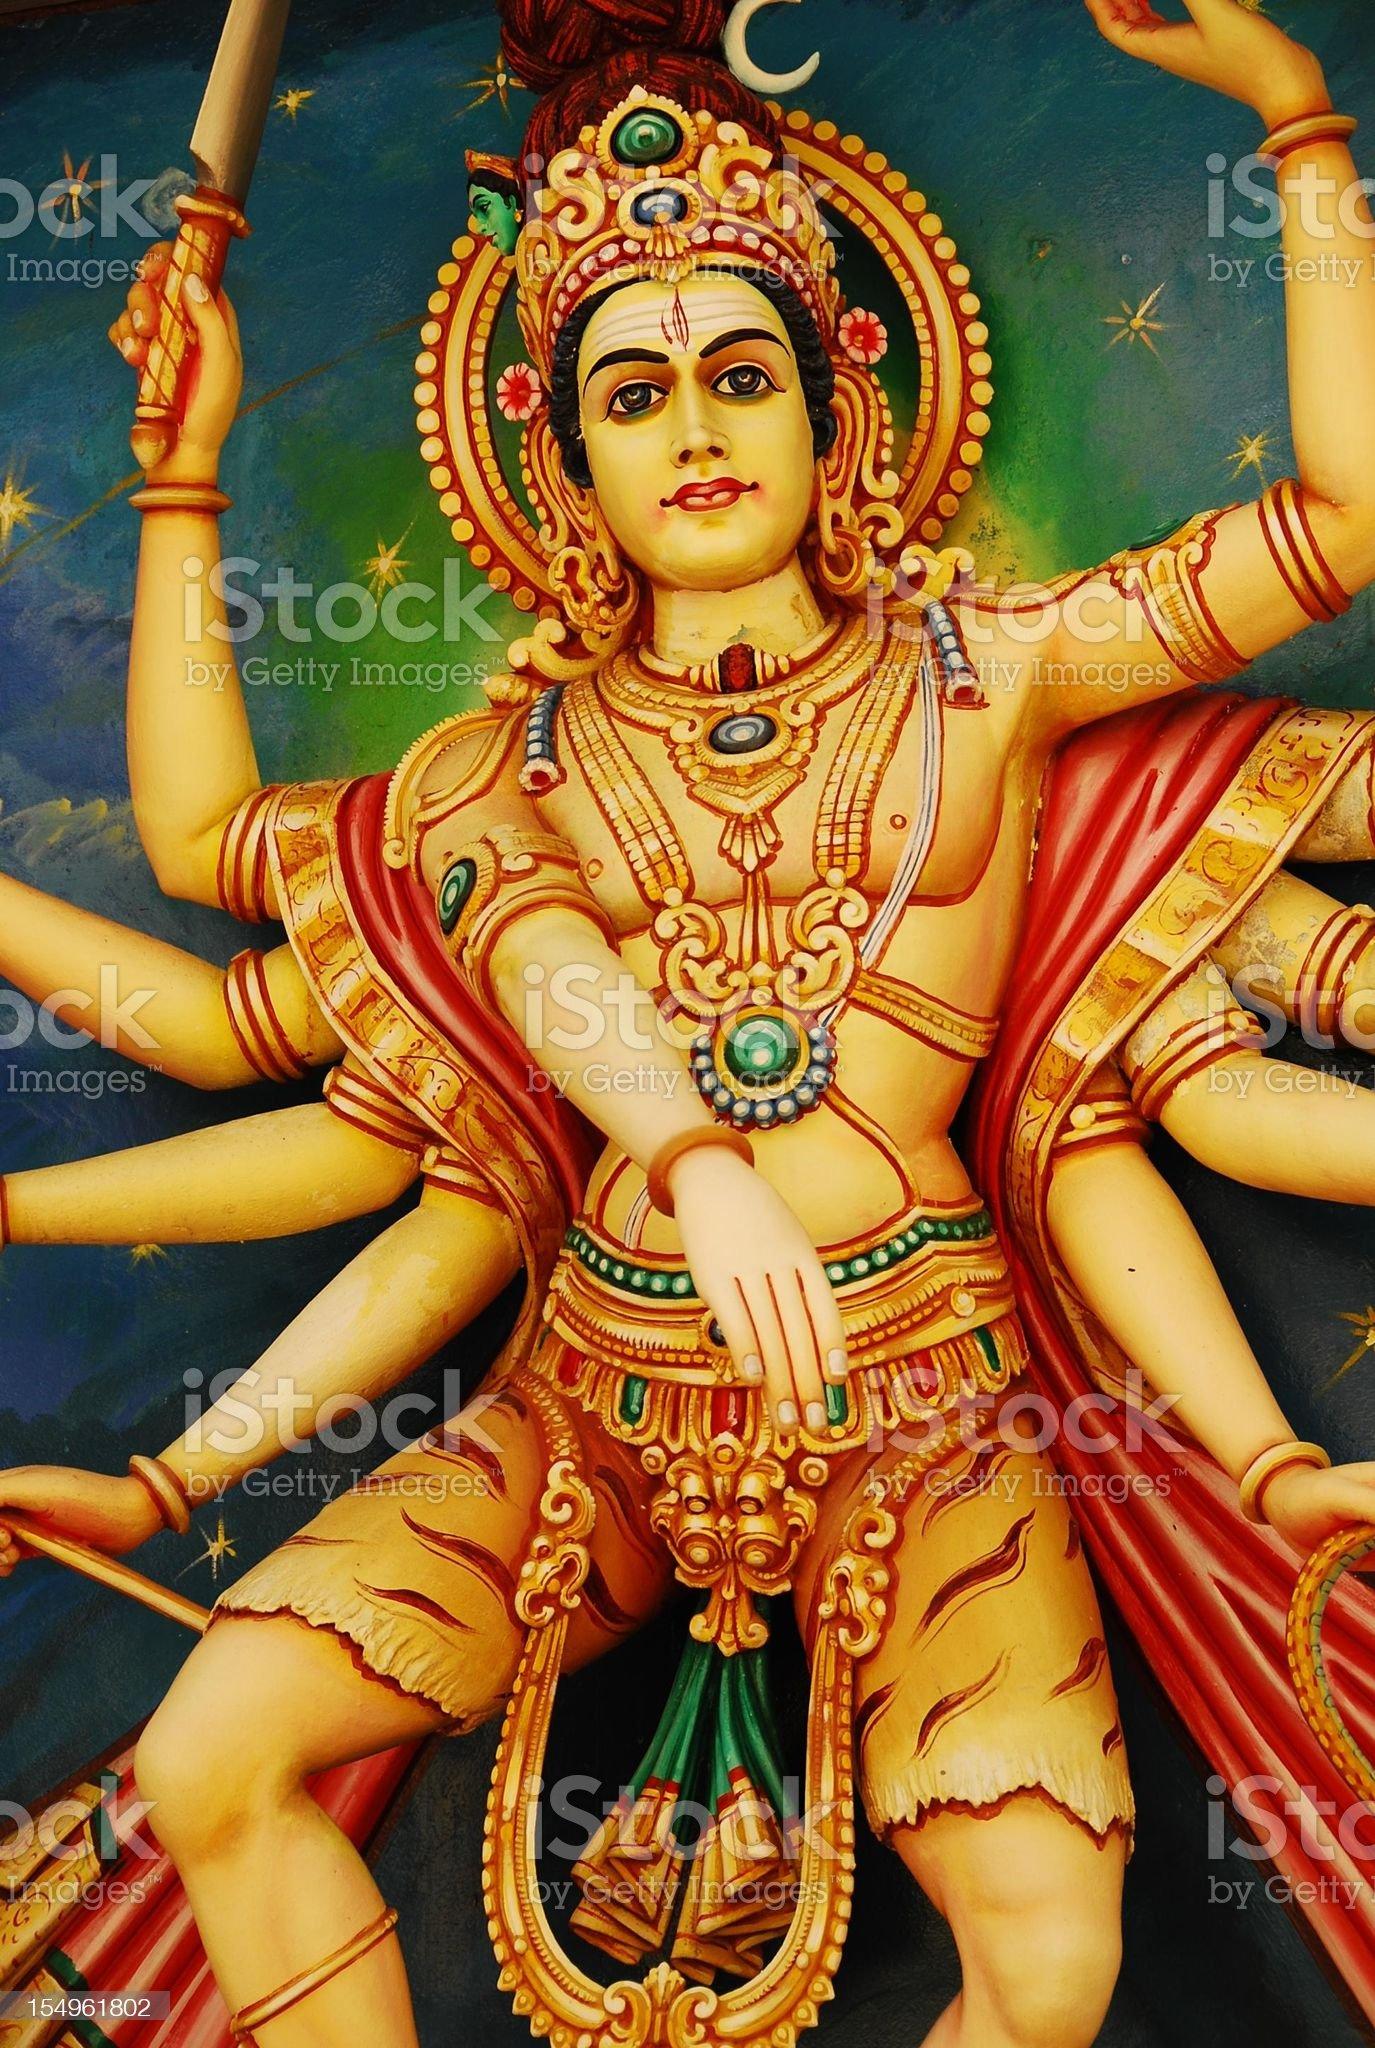 Lord Siva royalty-free stock photo